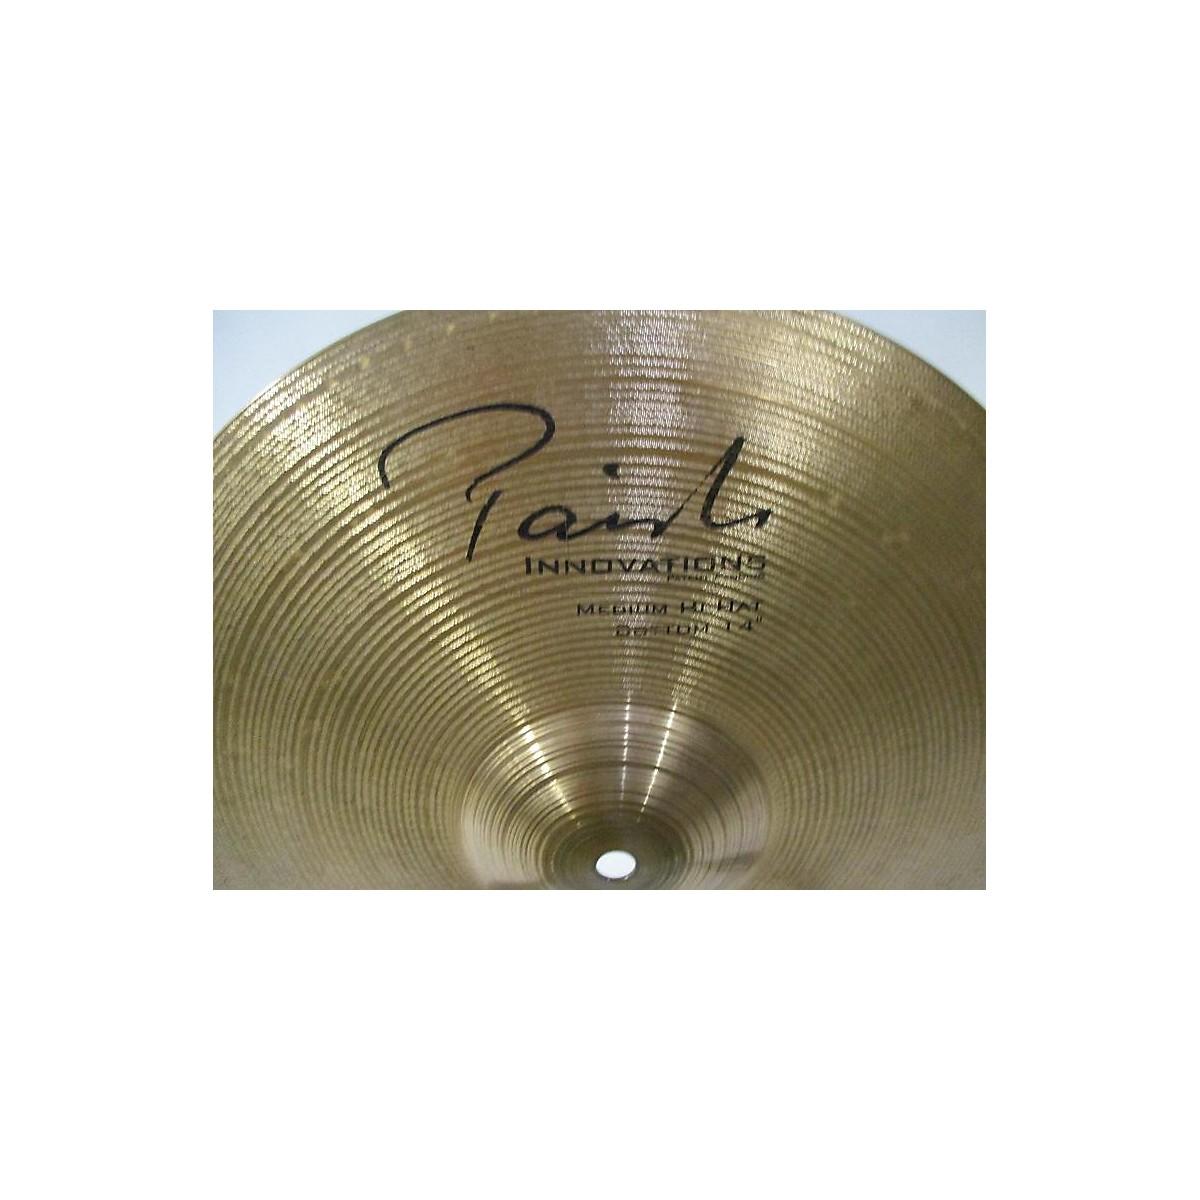 Paiste 14in Innovations Medium Hi-hat Pair Cymbal